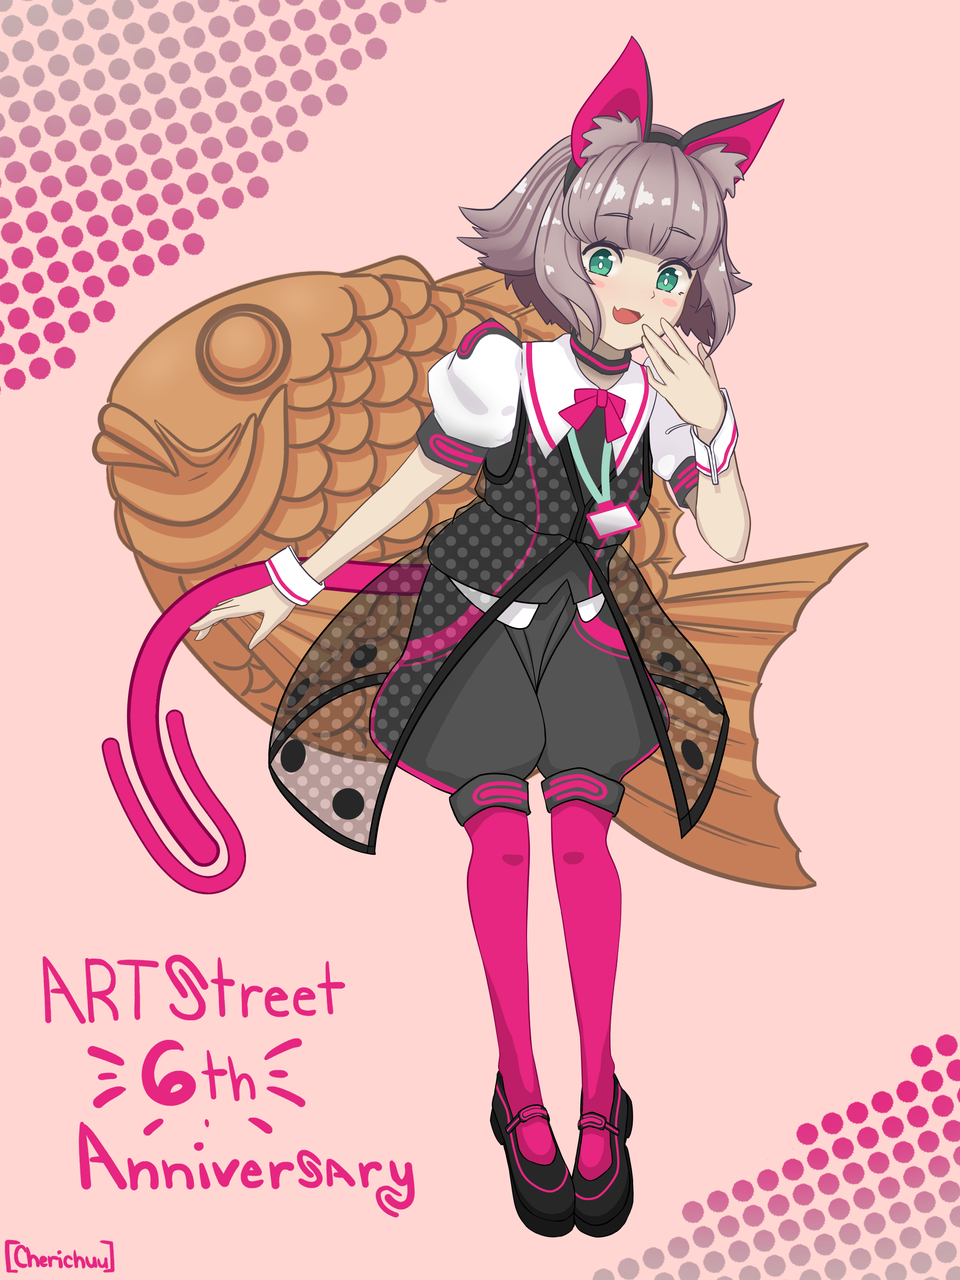 Meimi-chan Illust of Cherichuu General_Election_Meimichan MediBang_General_Election medibangpaint tail taiyaki pink